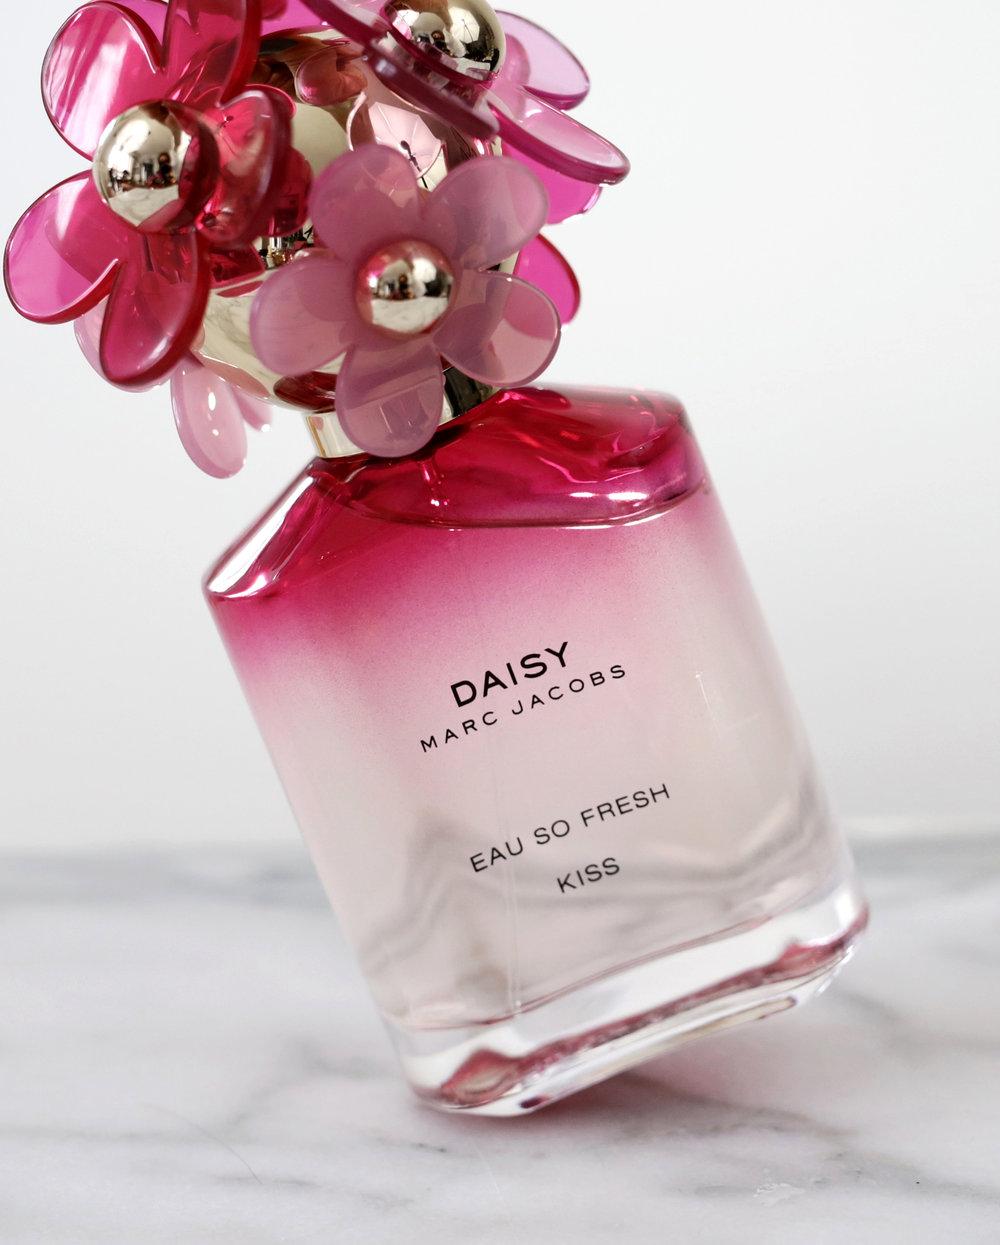 Fragrances i love for spring 2017 marc jacobs miu miu ysl marc jacobs daisy eau so fresh kiss izmirmasajfo Image collections